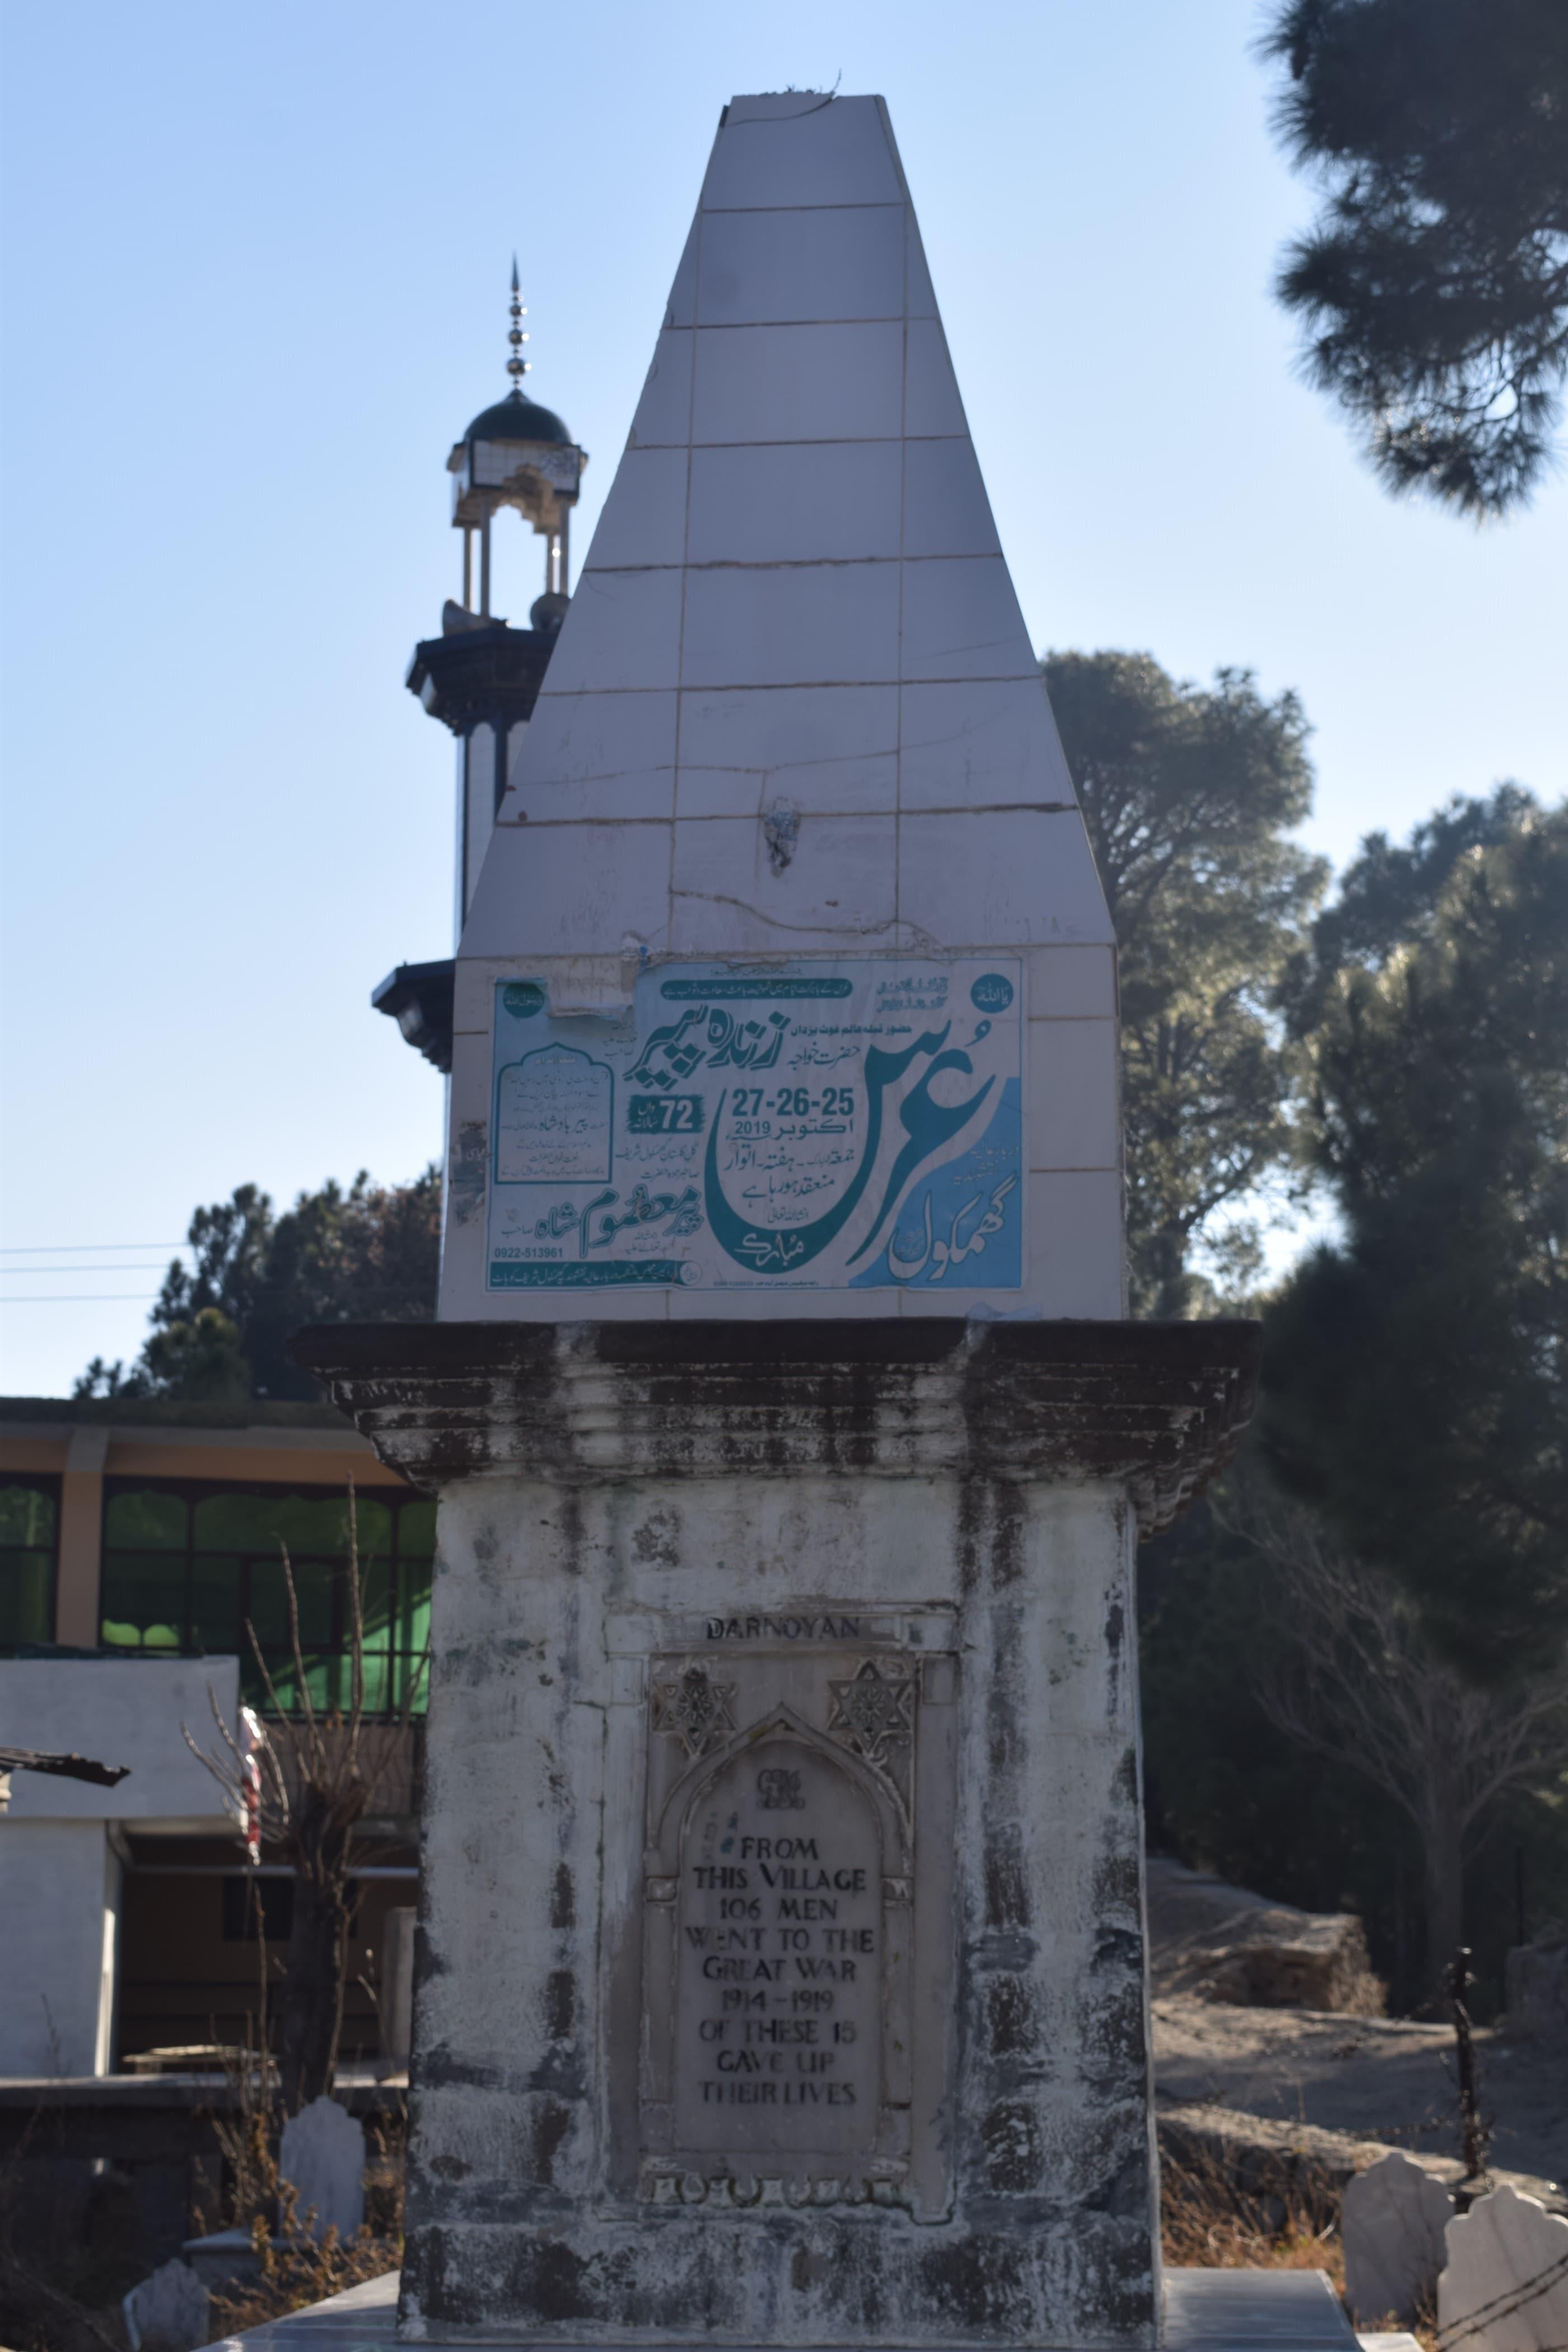 The burj at Darnoyan.